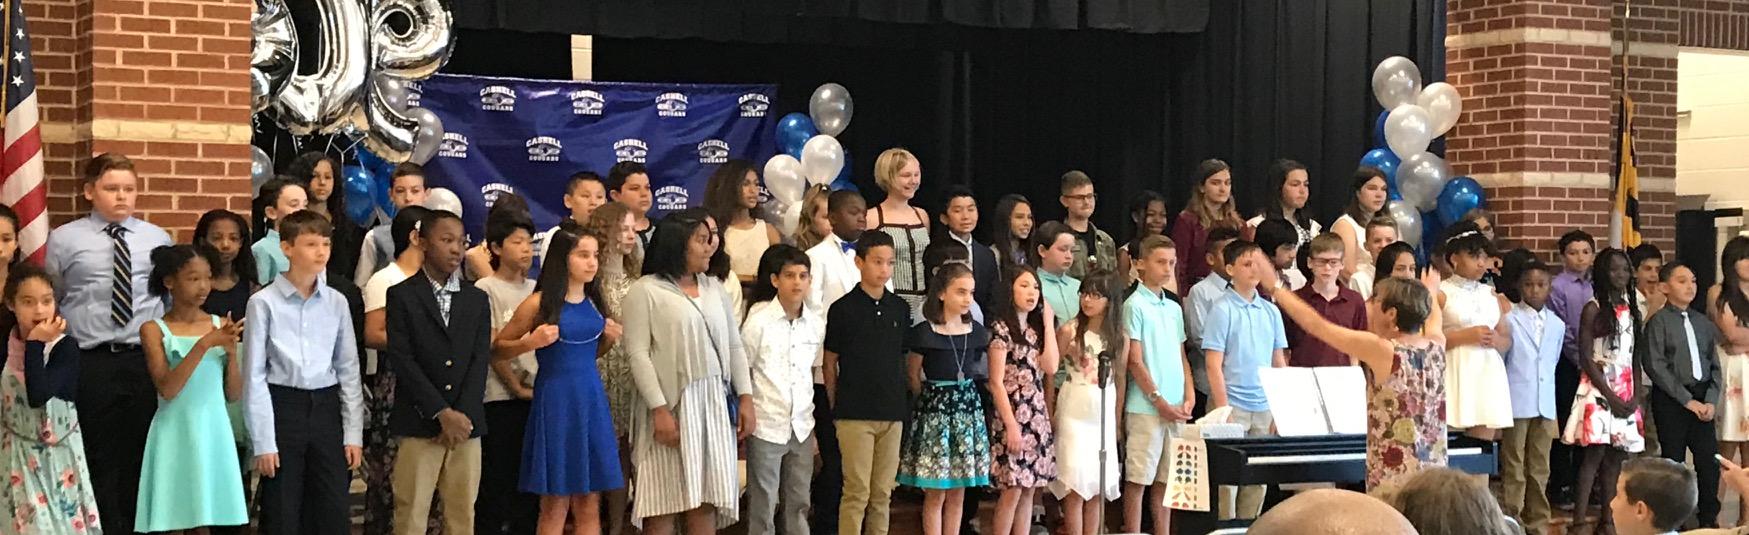 5th Grade Promotion Ceremony, 2019